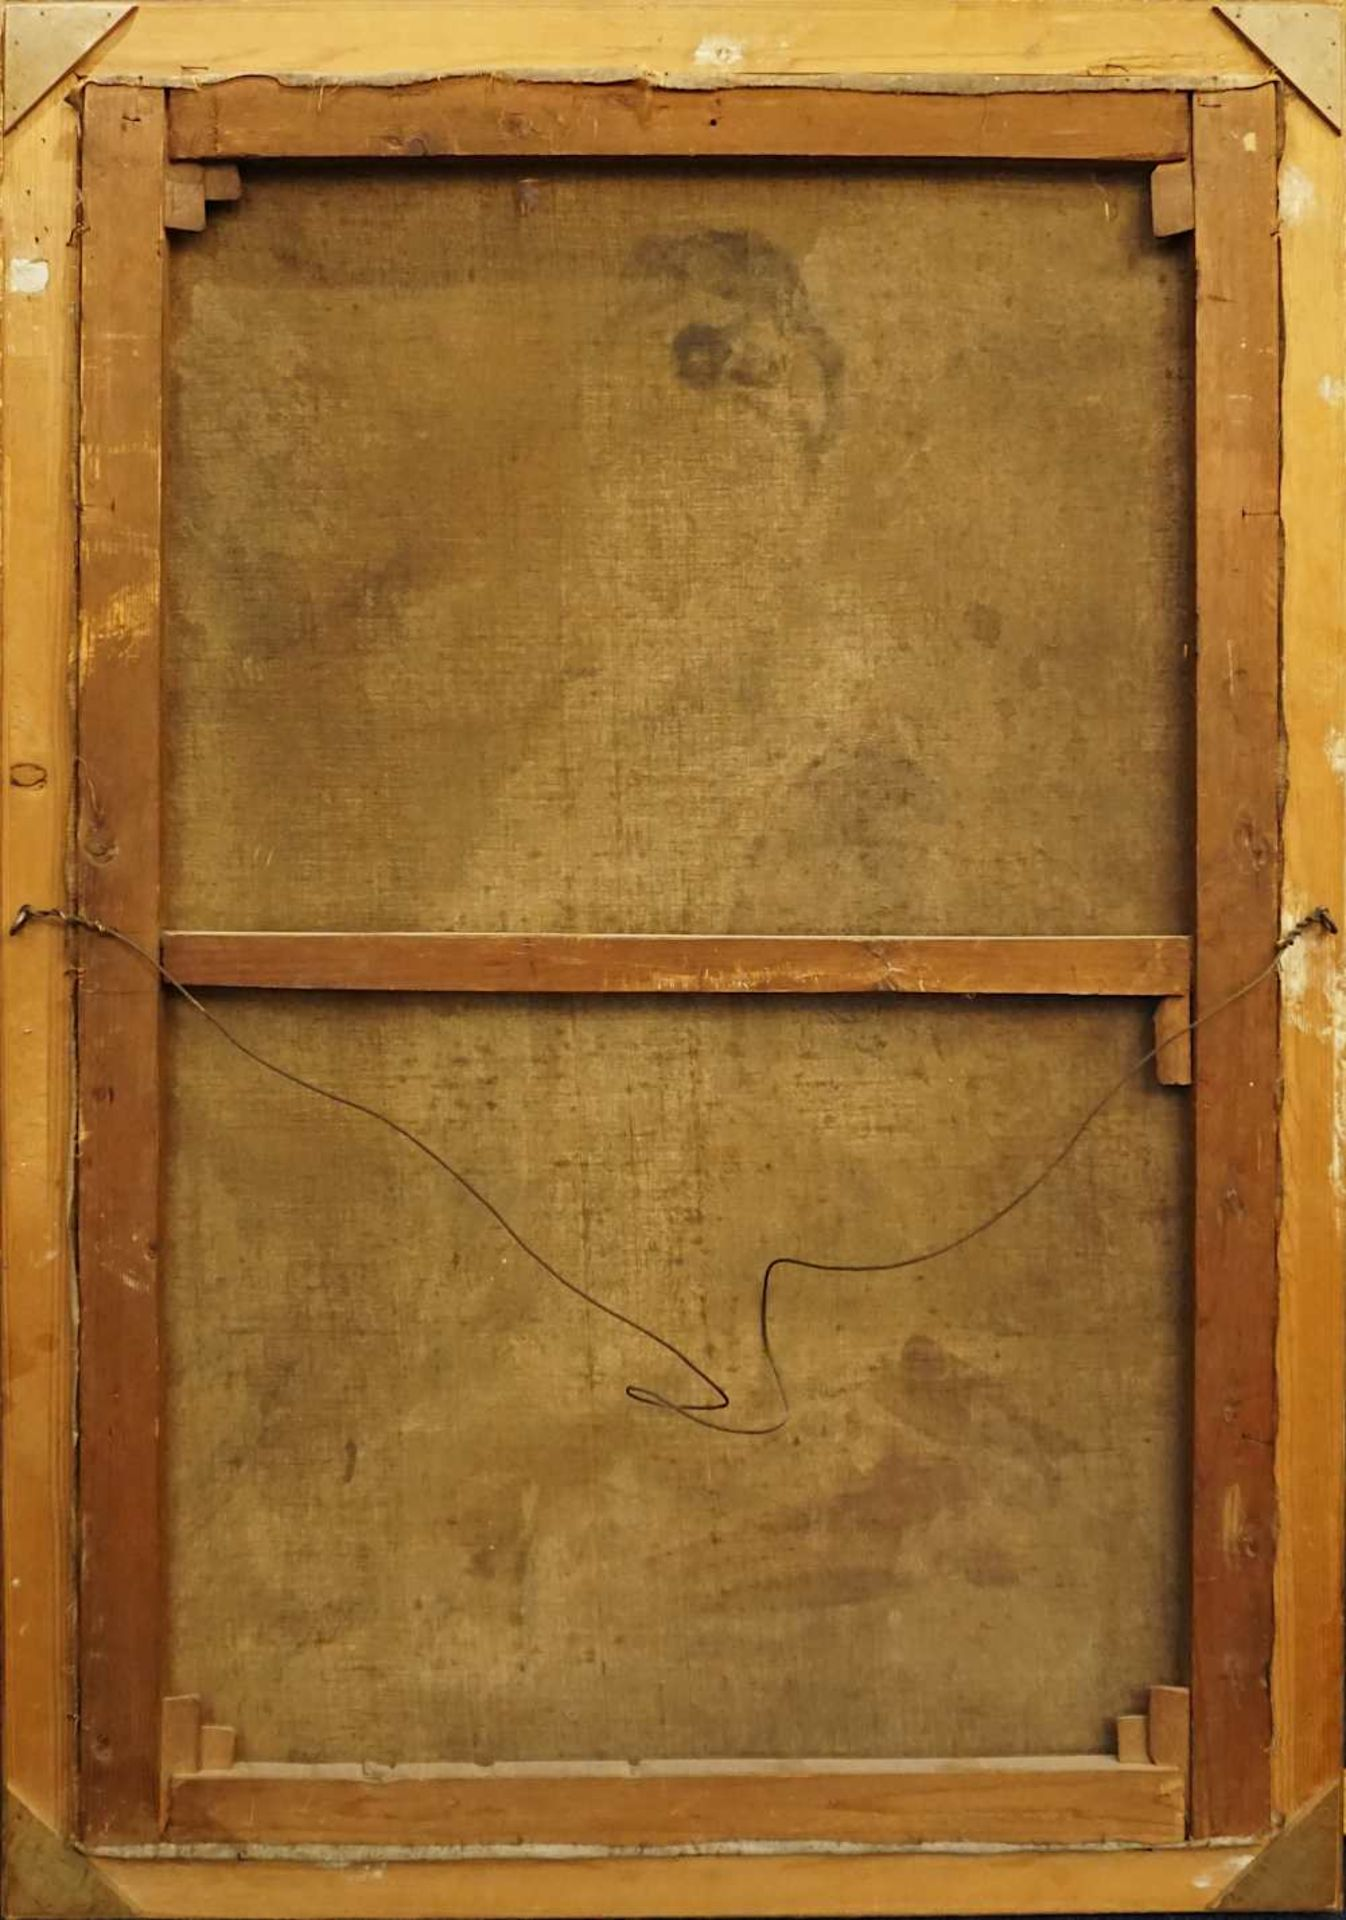 "1 Ölgemälde ""Dame mit Pelzschal"" L.o. sign. G. HAID (wohl Georg H. 1861-1935) R.o. w - Bild 4 aus 4"